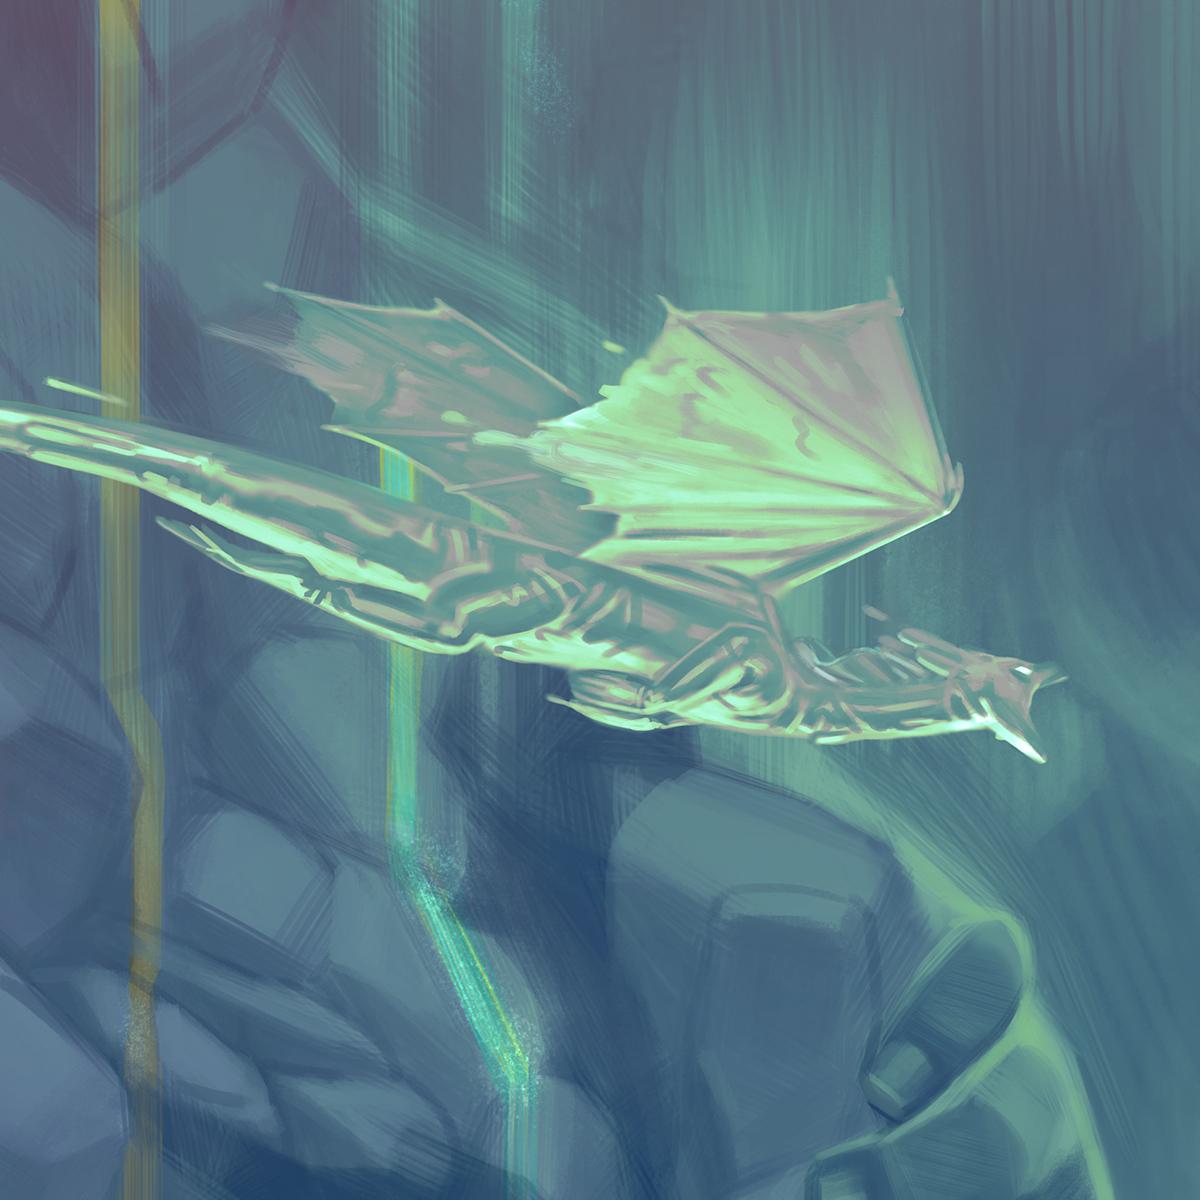 troll-bridge-detail3.jpg